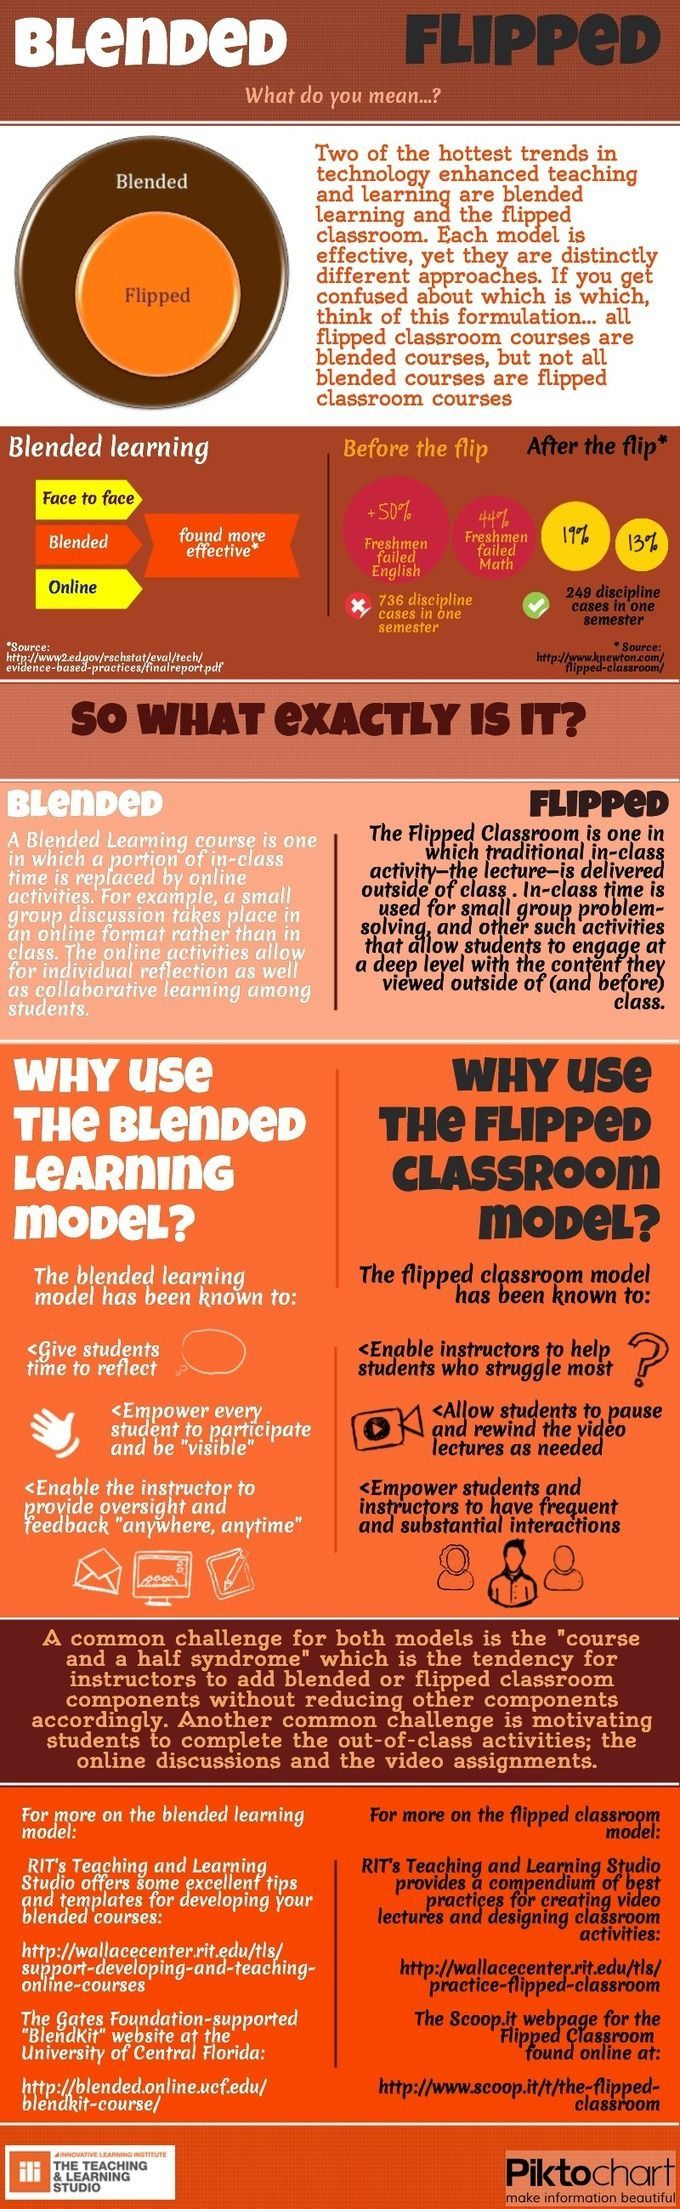 ¿Qué es y en qué se diferencian Blended-Learning y Flipped-Learning? FC como un elemento del Blended Learning